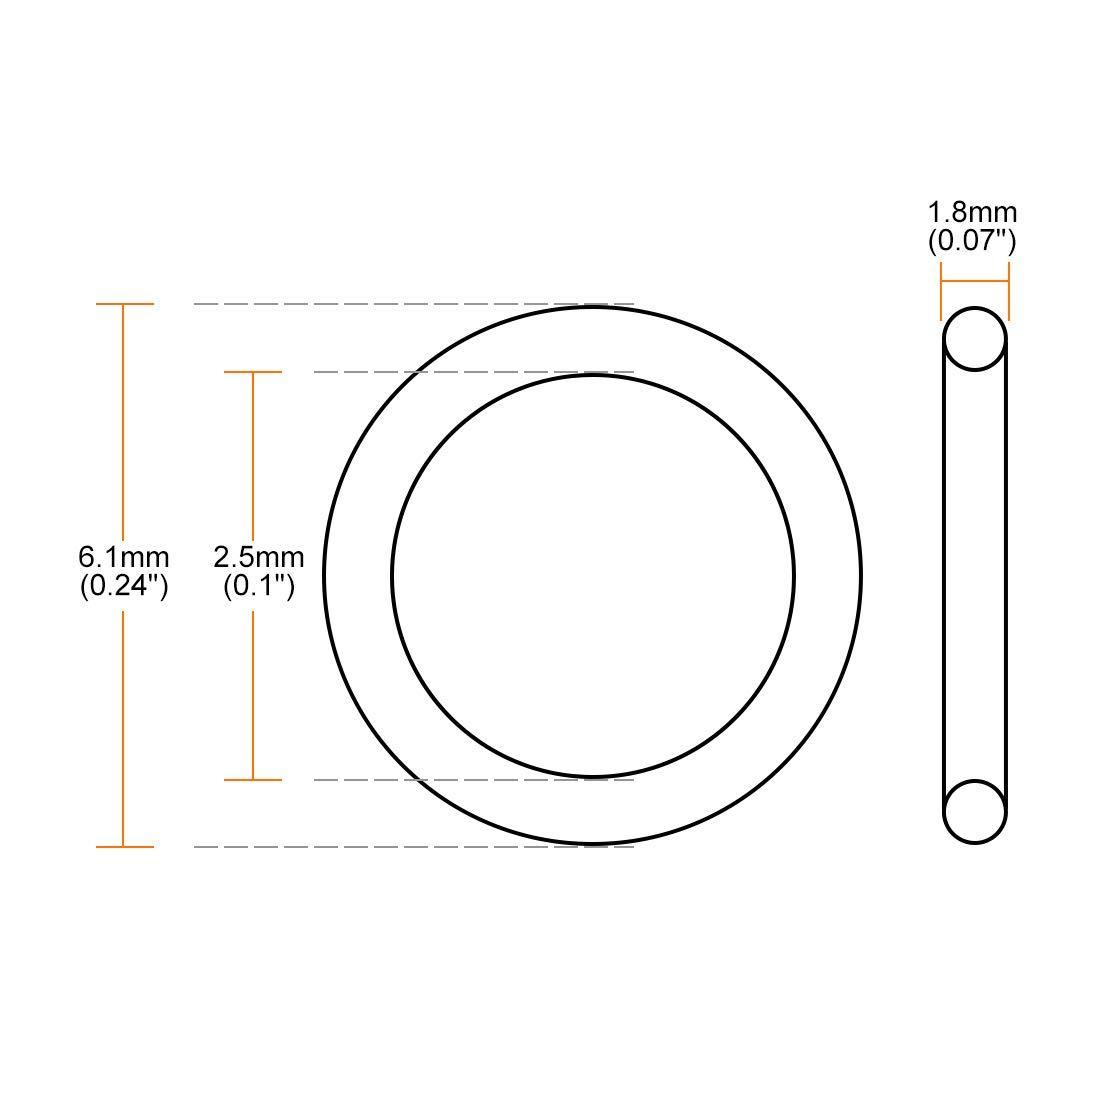 Pack of 10 sourcing map Nitrile Rubber O-Rings 6.1mm OD 2.5mm ID 1.8mm Width Metric Buna-N Sealing Gasket